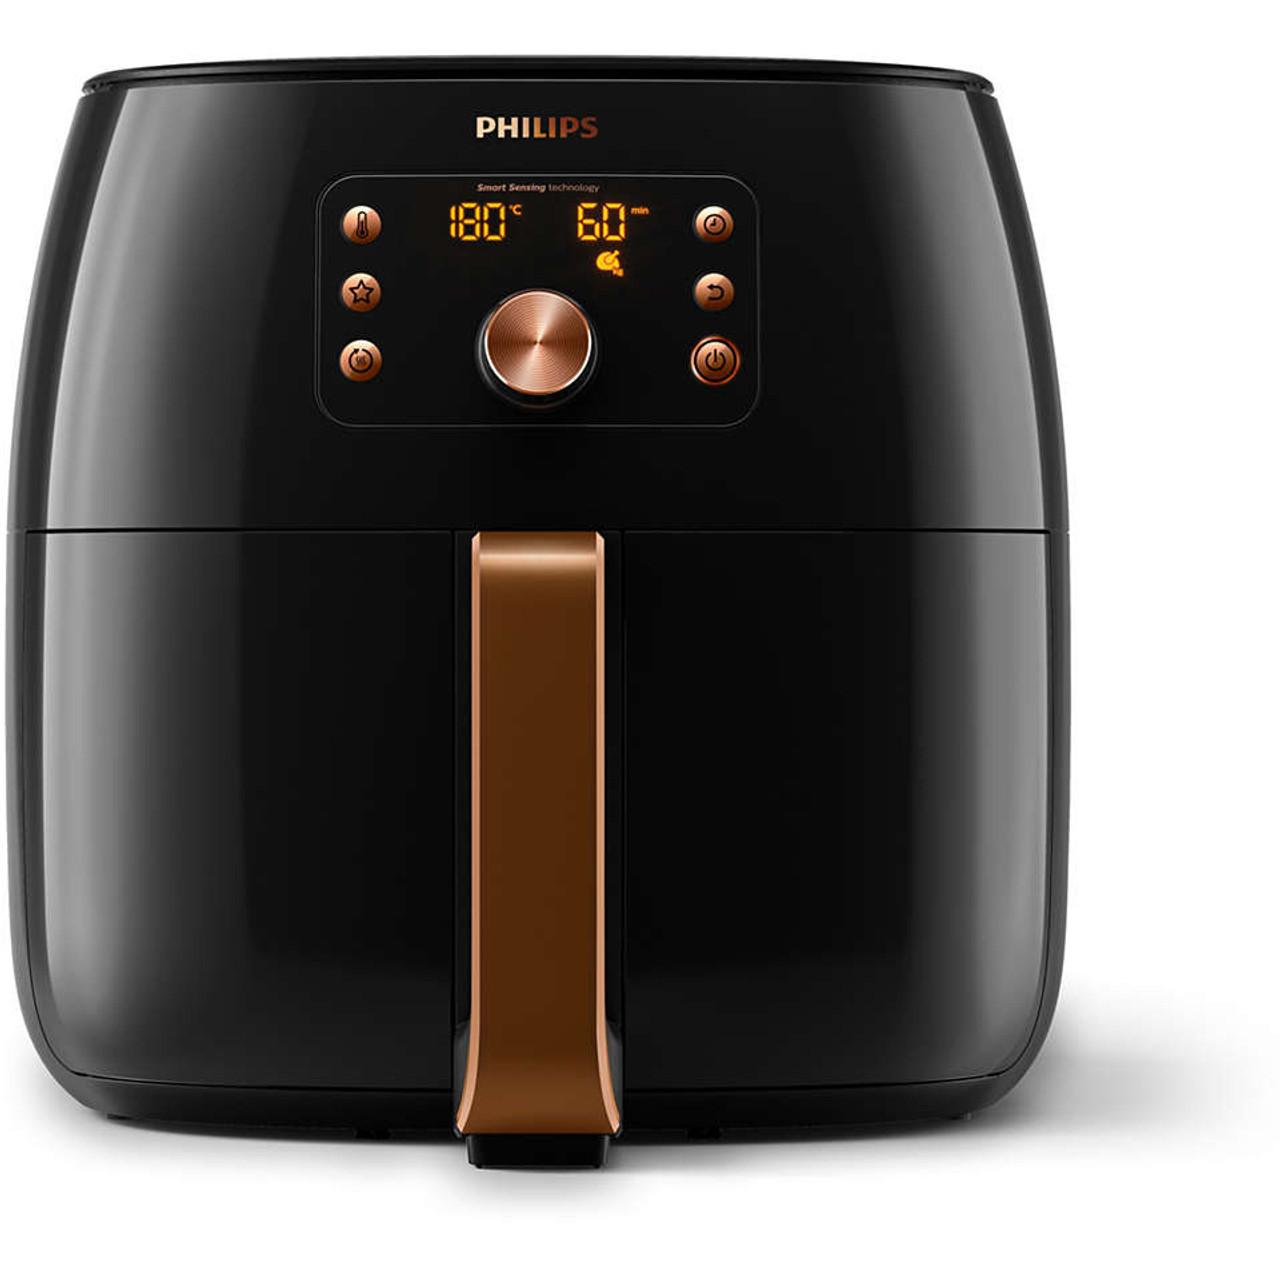 Philips HD9861/99 Smart Digital Airfryer XXL With Smart Sensing Tech - Black